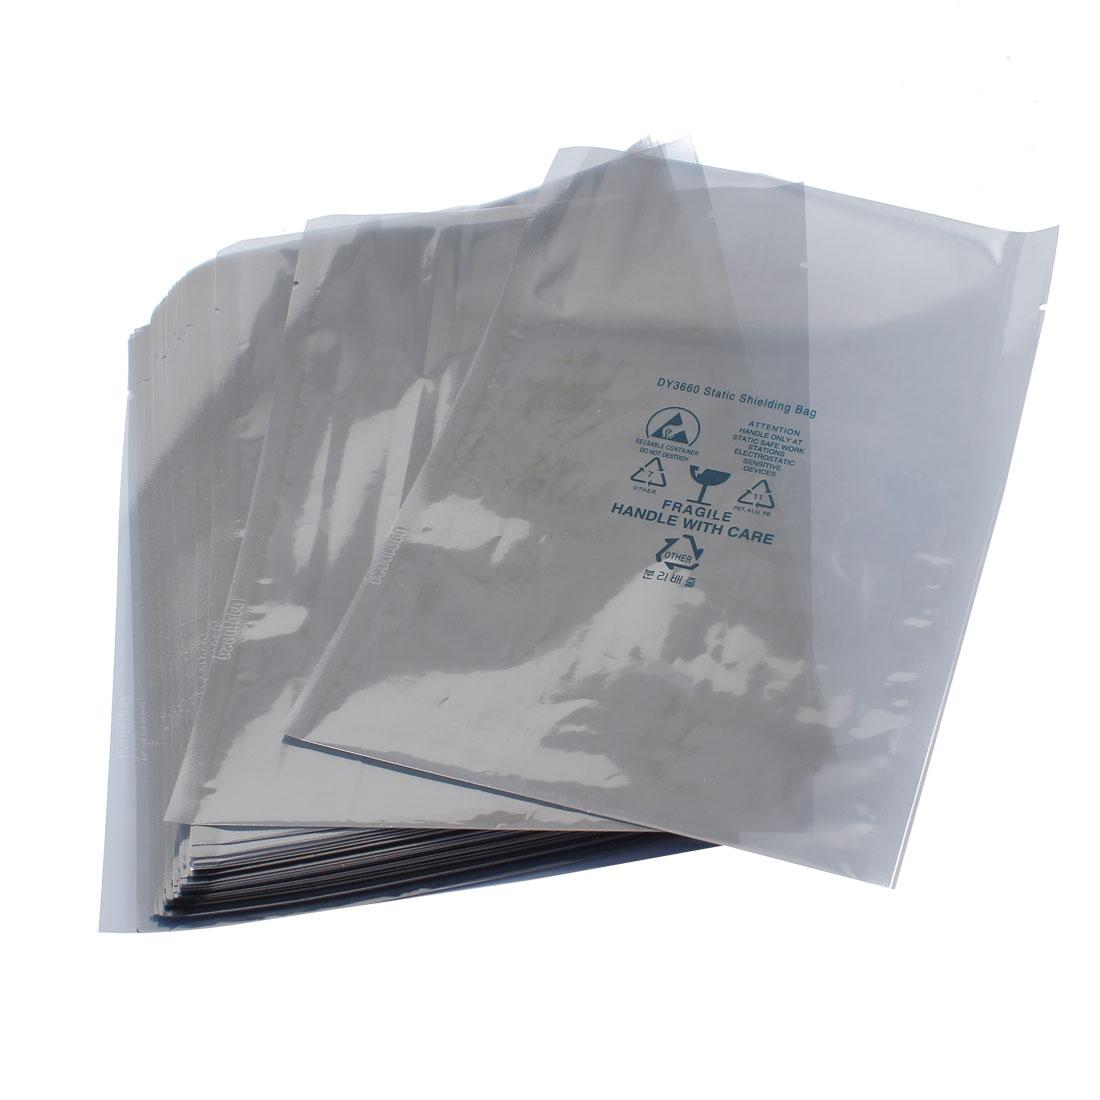 "Unique Bargains 50 Pcs 6"" x 8"" ESD PCB Board Anti-Static Shielding Bags"